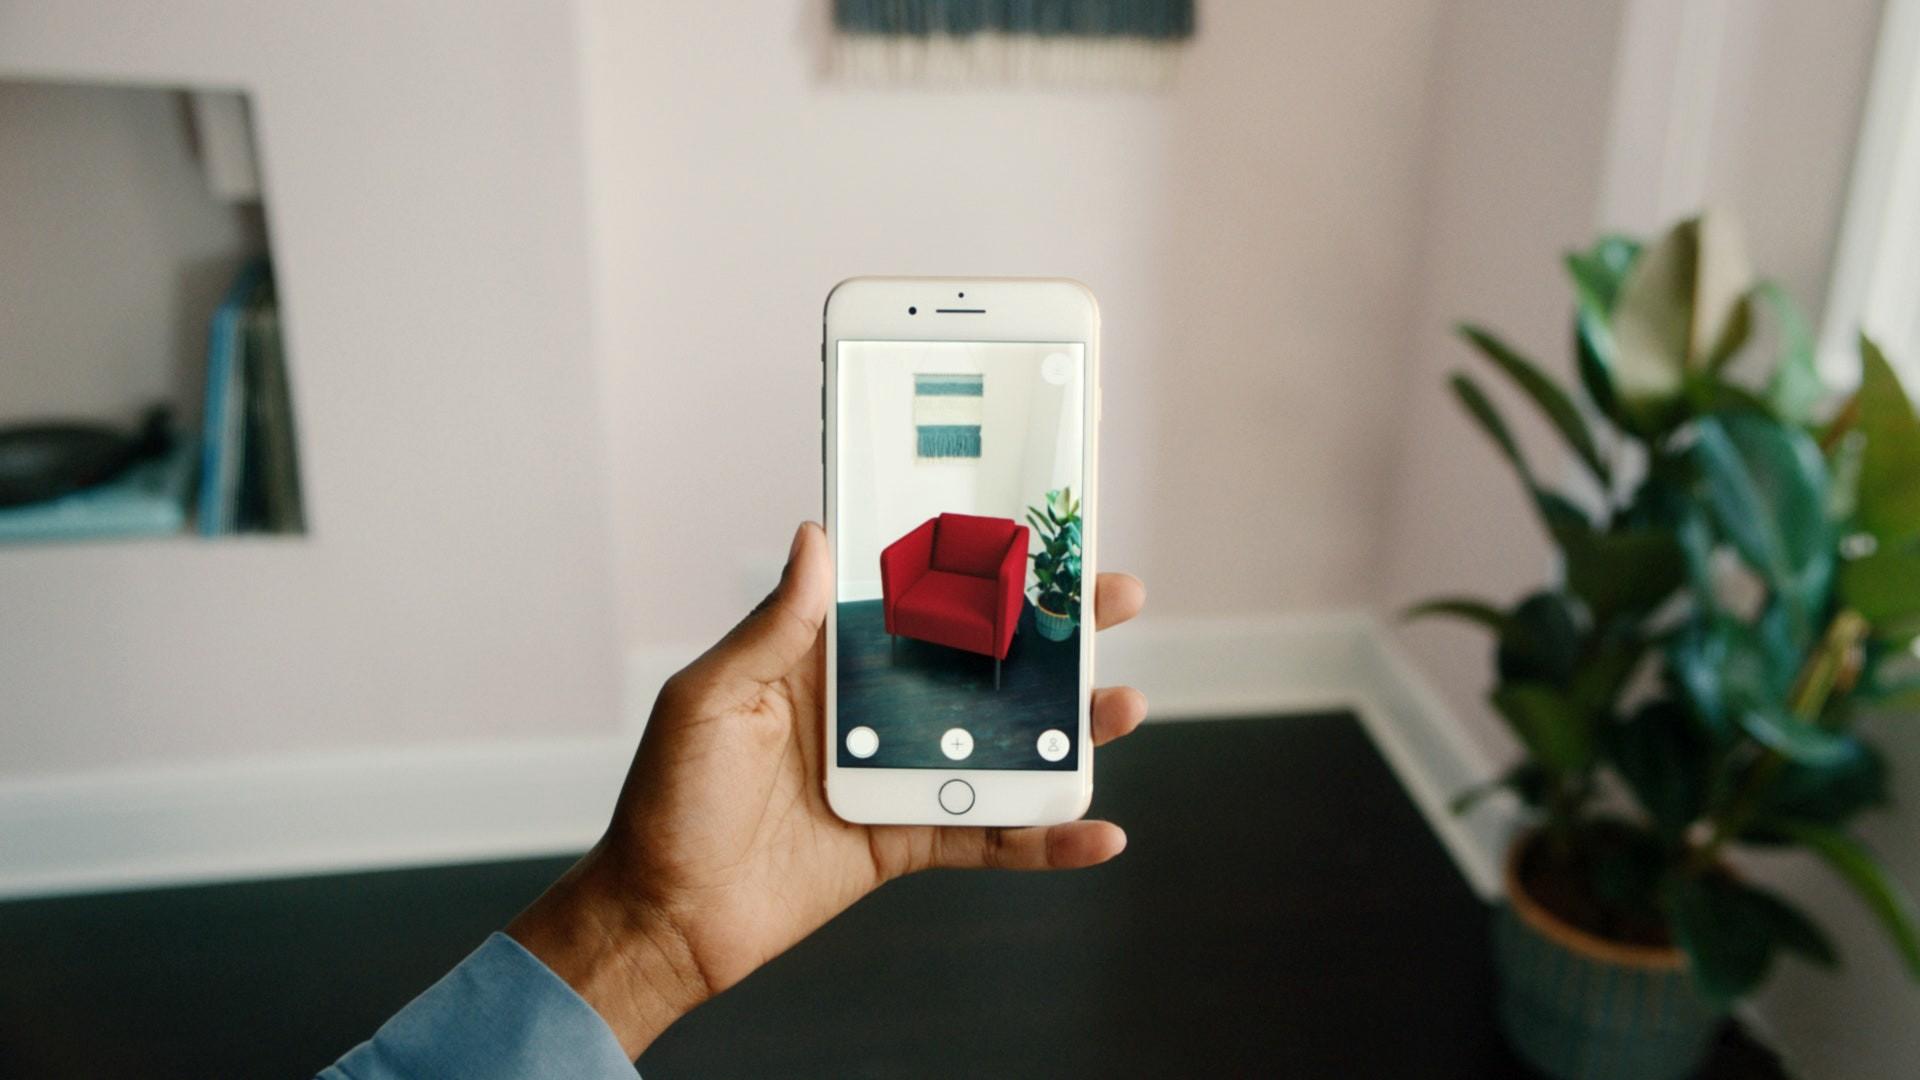 AR furniture apps